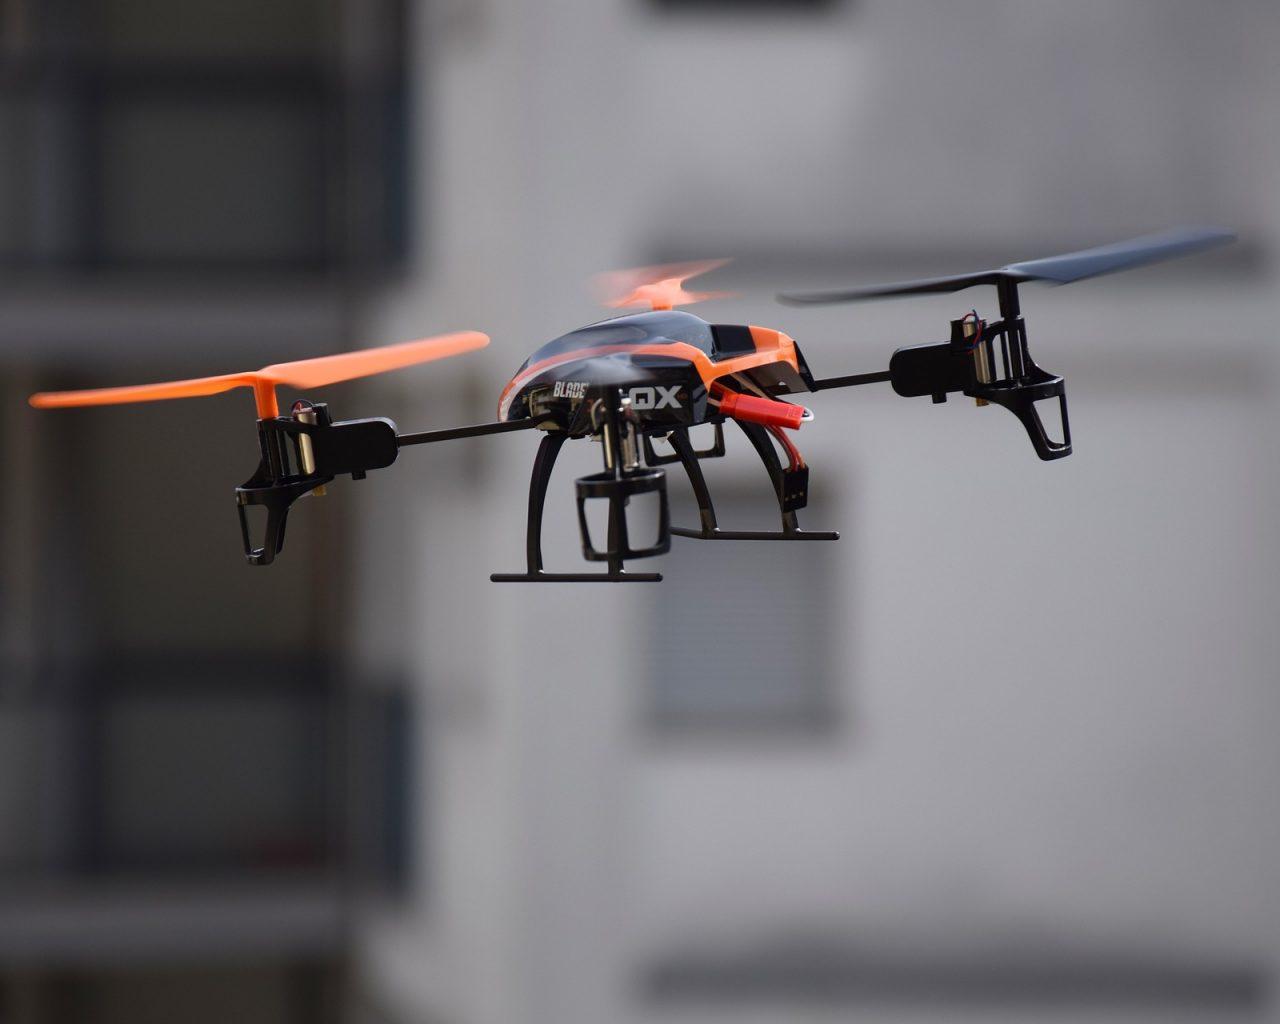 Inregistrare drona